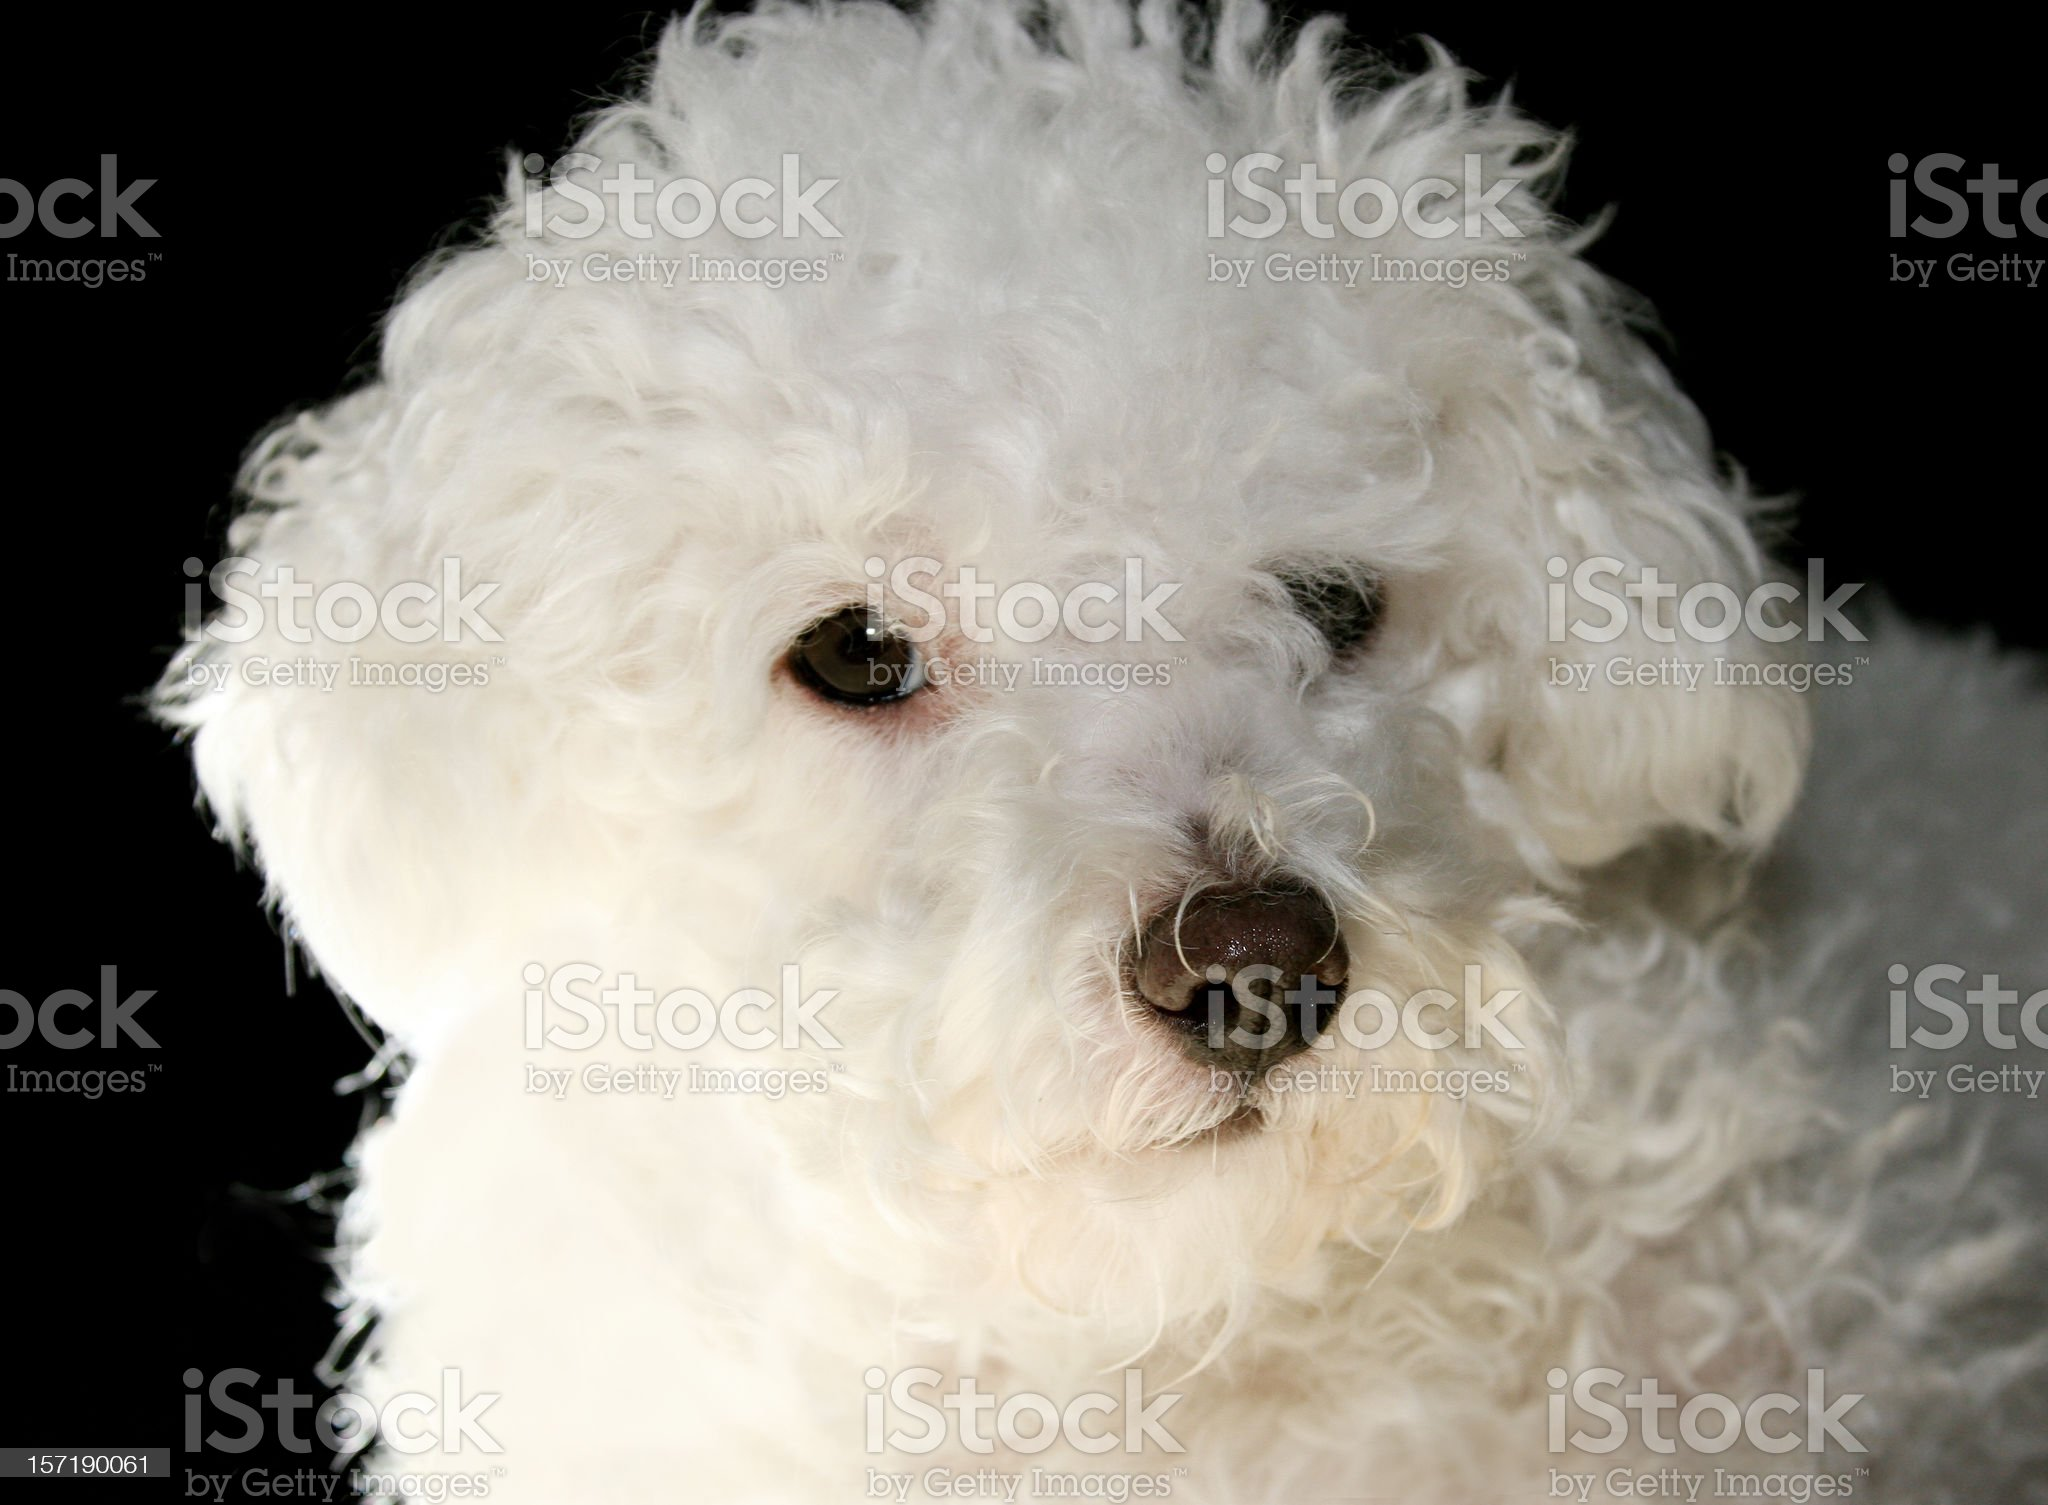 Bichon Close-up royalty-free stock photo